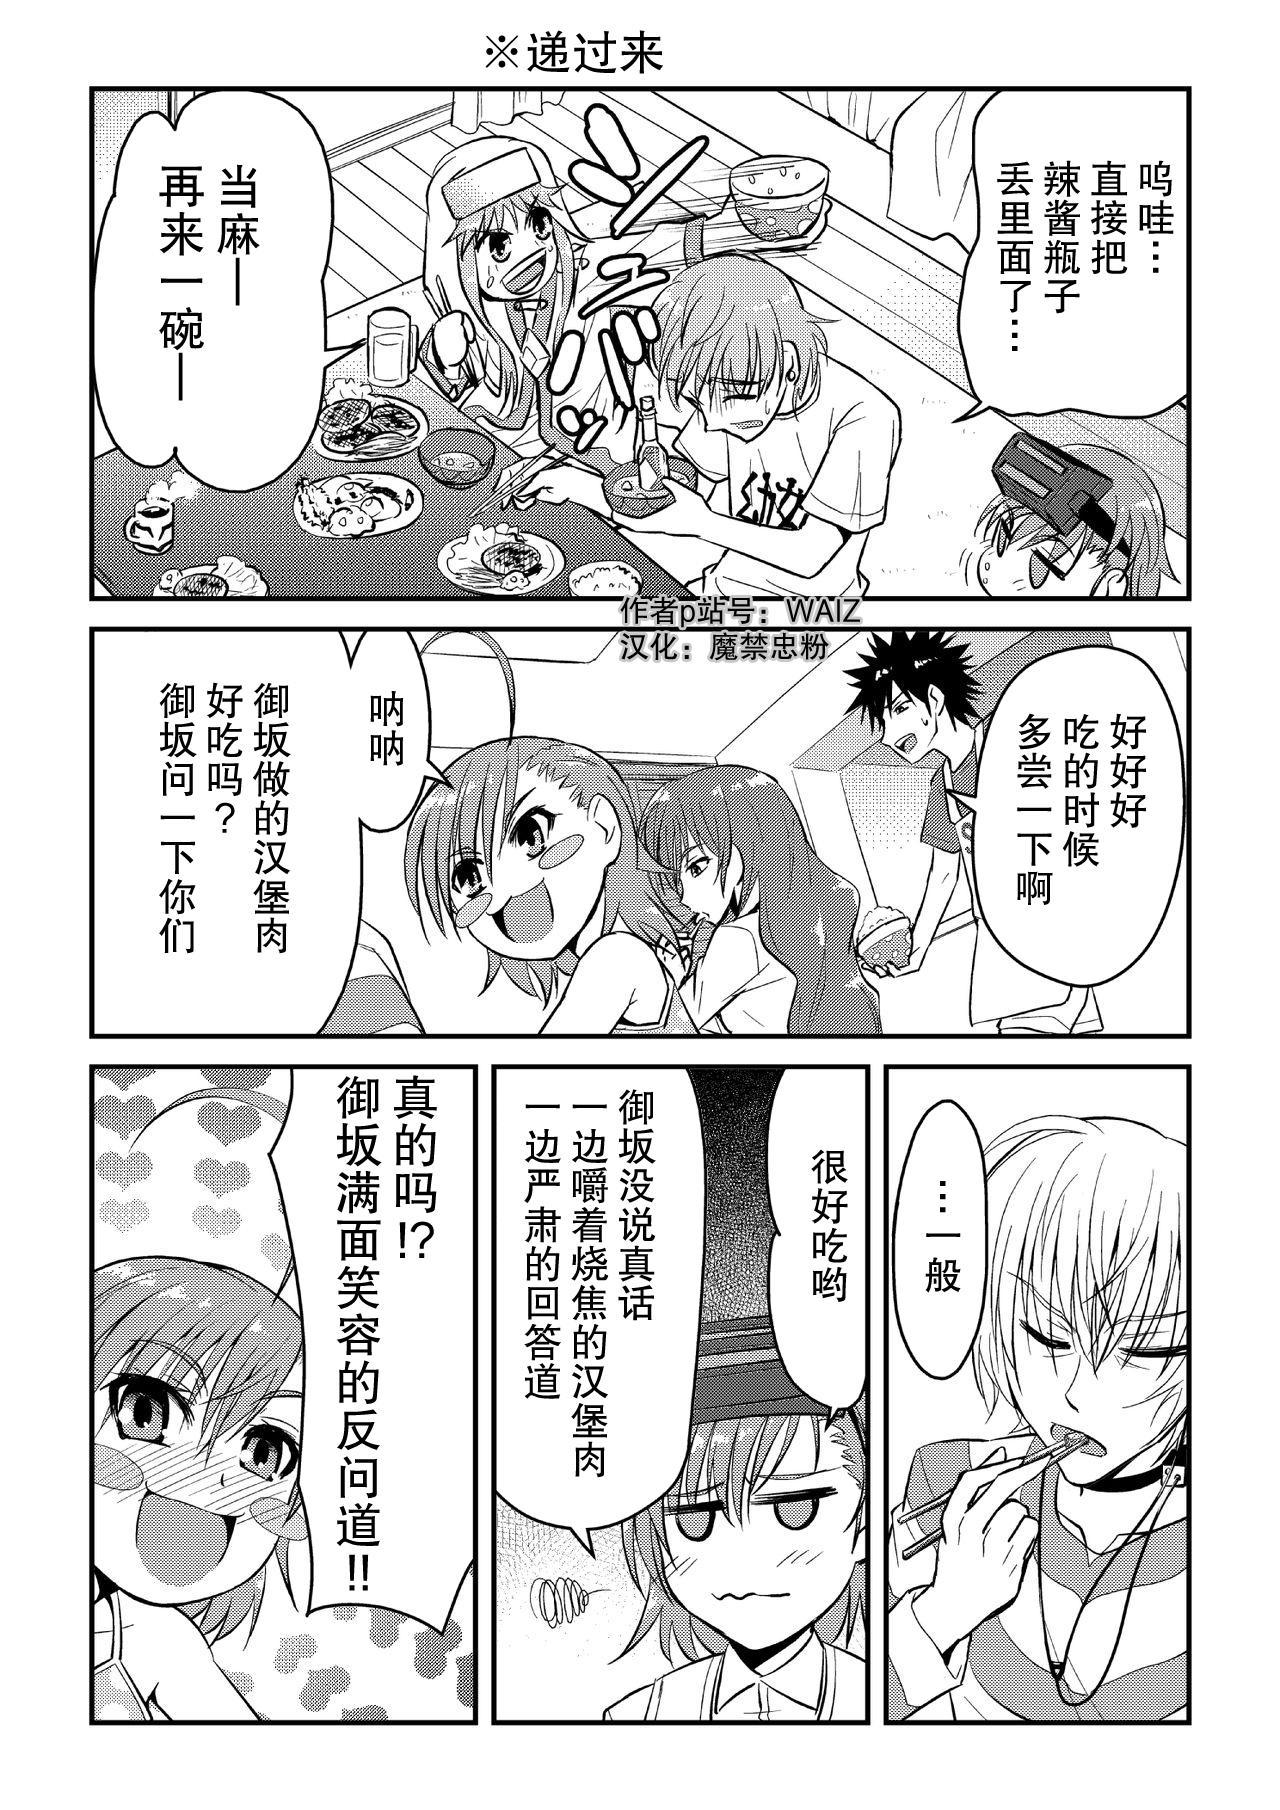 [WAIZ][同人个人渣汉化][就算是上条先生我家要住7个人还是太勉强了](Toaru Majutsu no Index) [中国翻译] 13